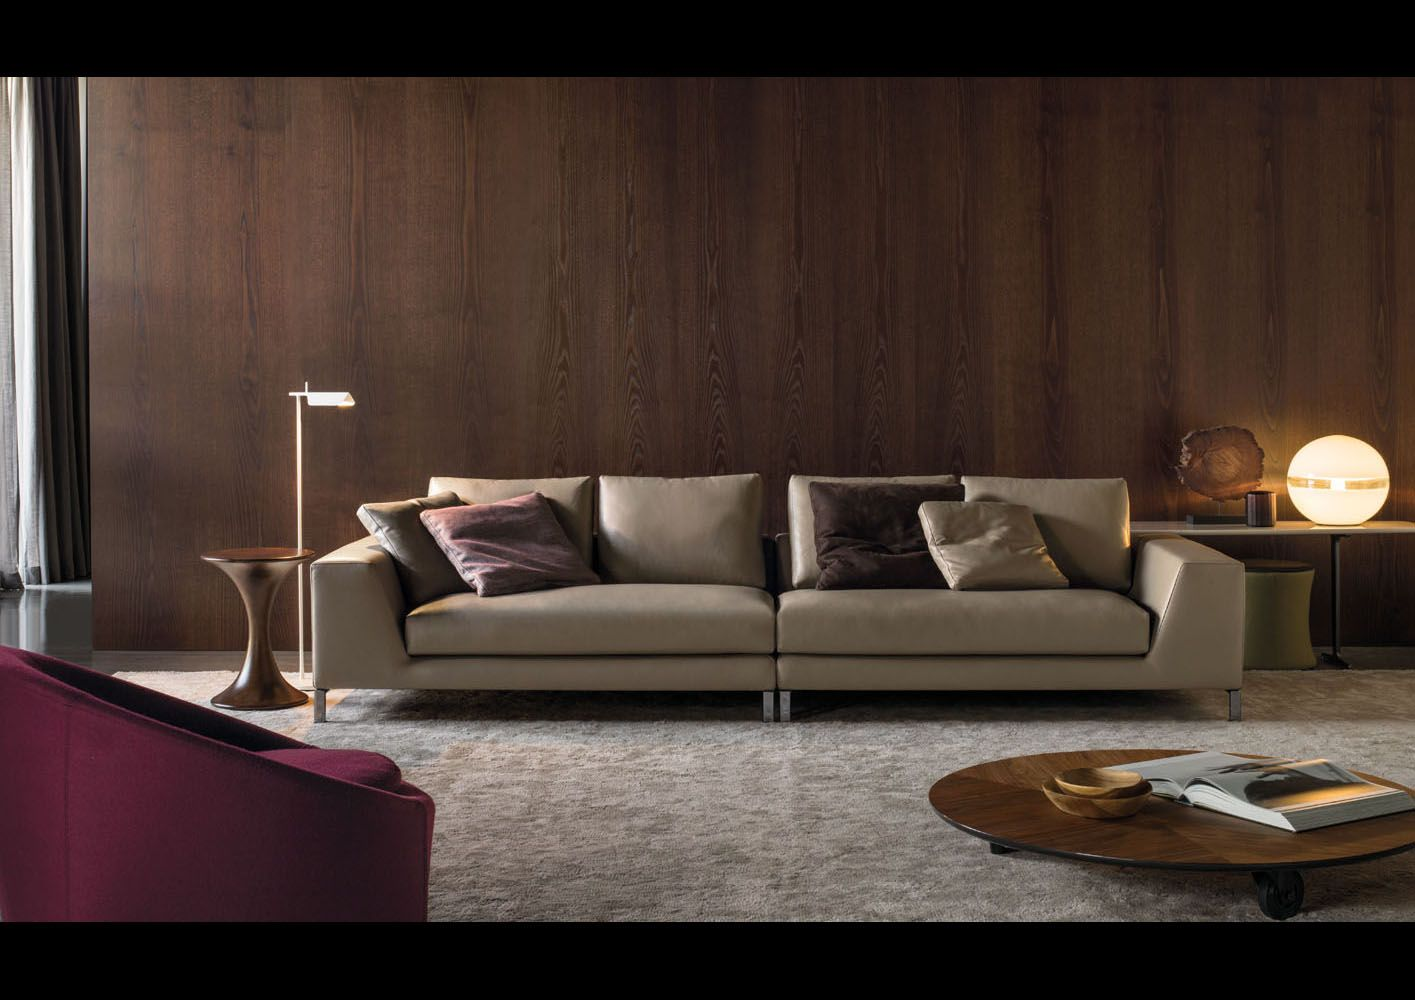 minotti hamilton islands sofa designed by rodolfo dordoni. Black Bedroom Furniture Sets. Home Design Ideas